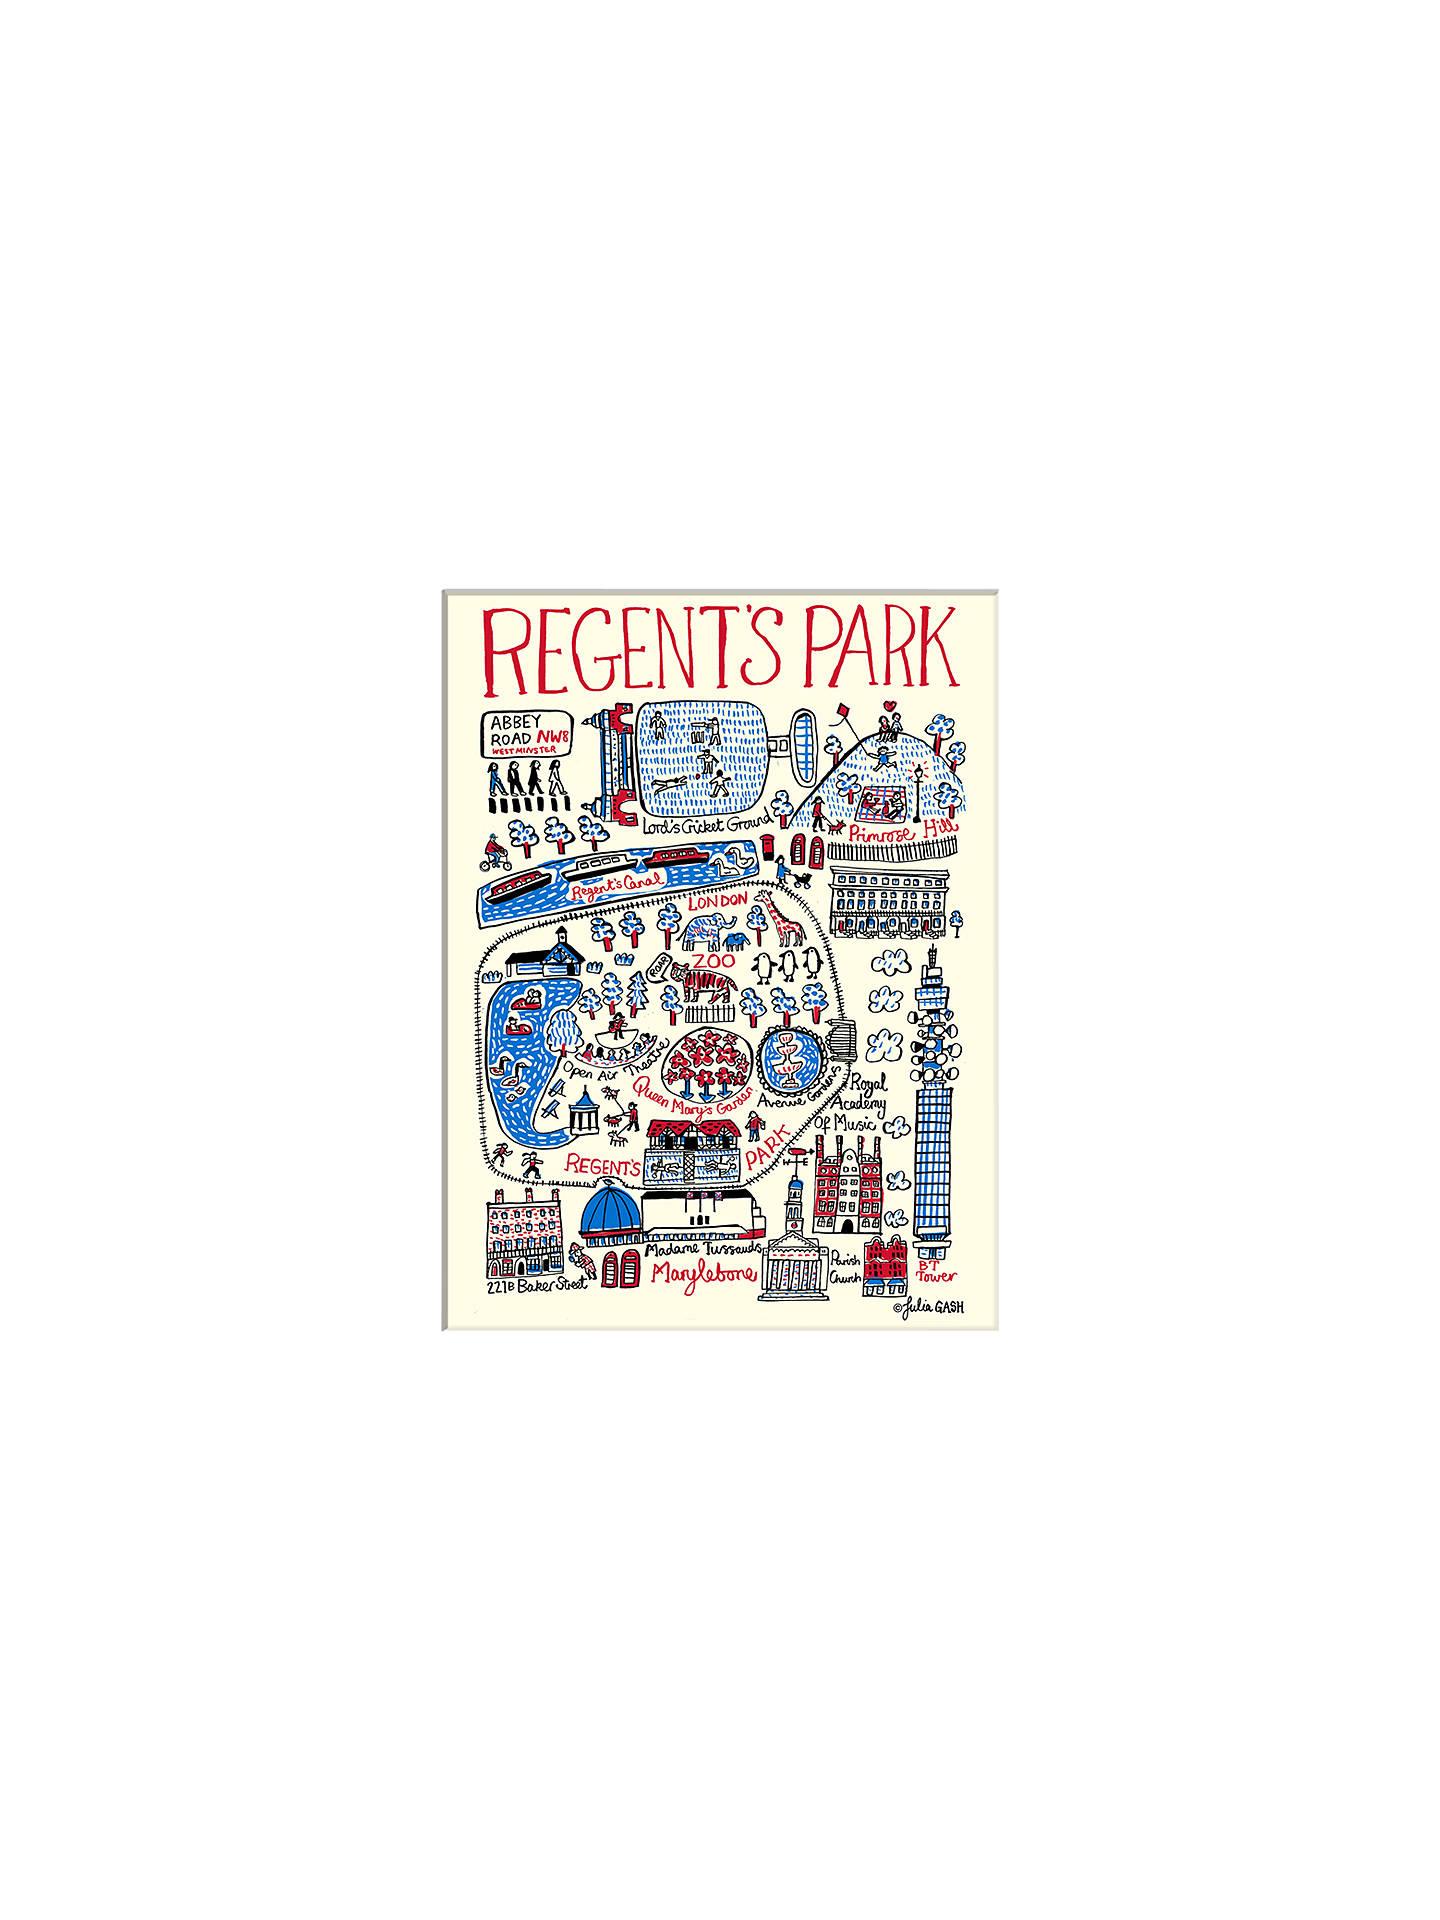 Julia Gash Regent s Park Unframed Print with Mount 30 x 40cm at